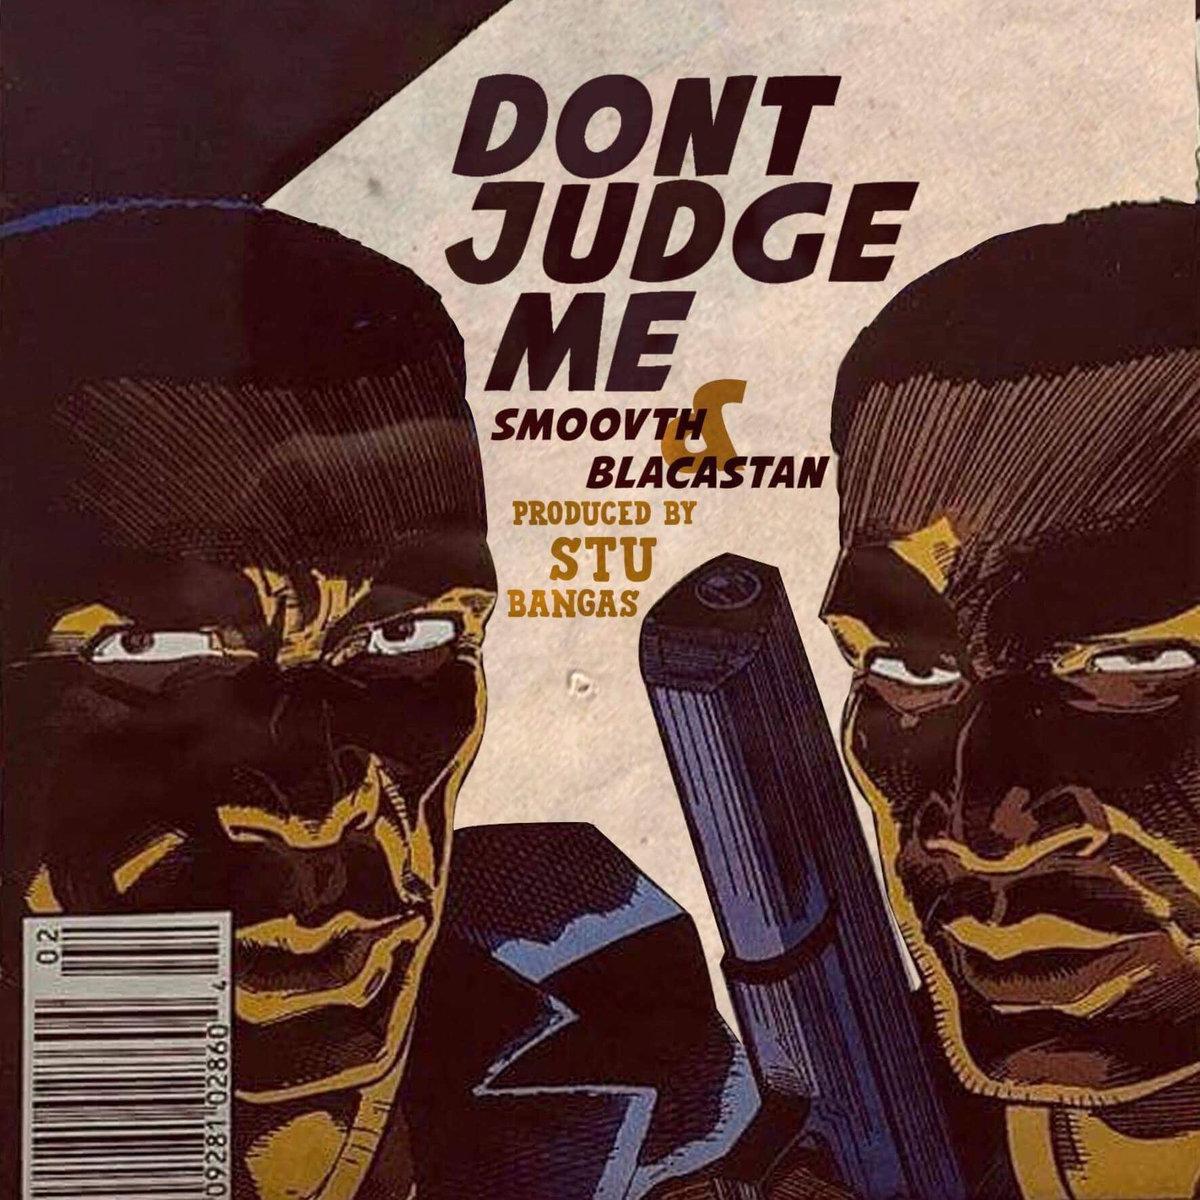 Smoovth___blacastan_-_dont_judge_me